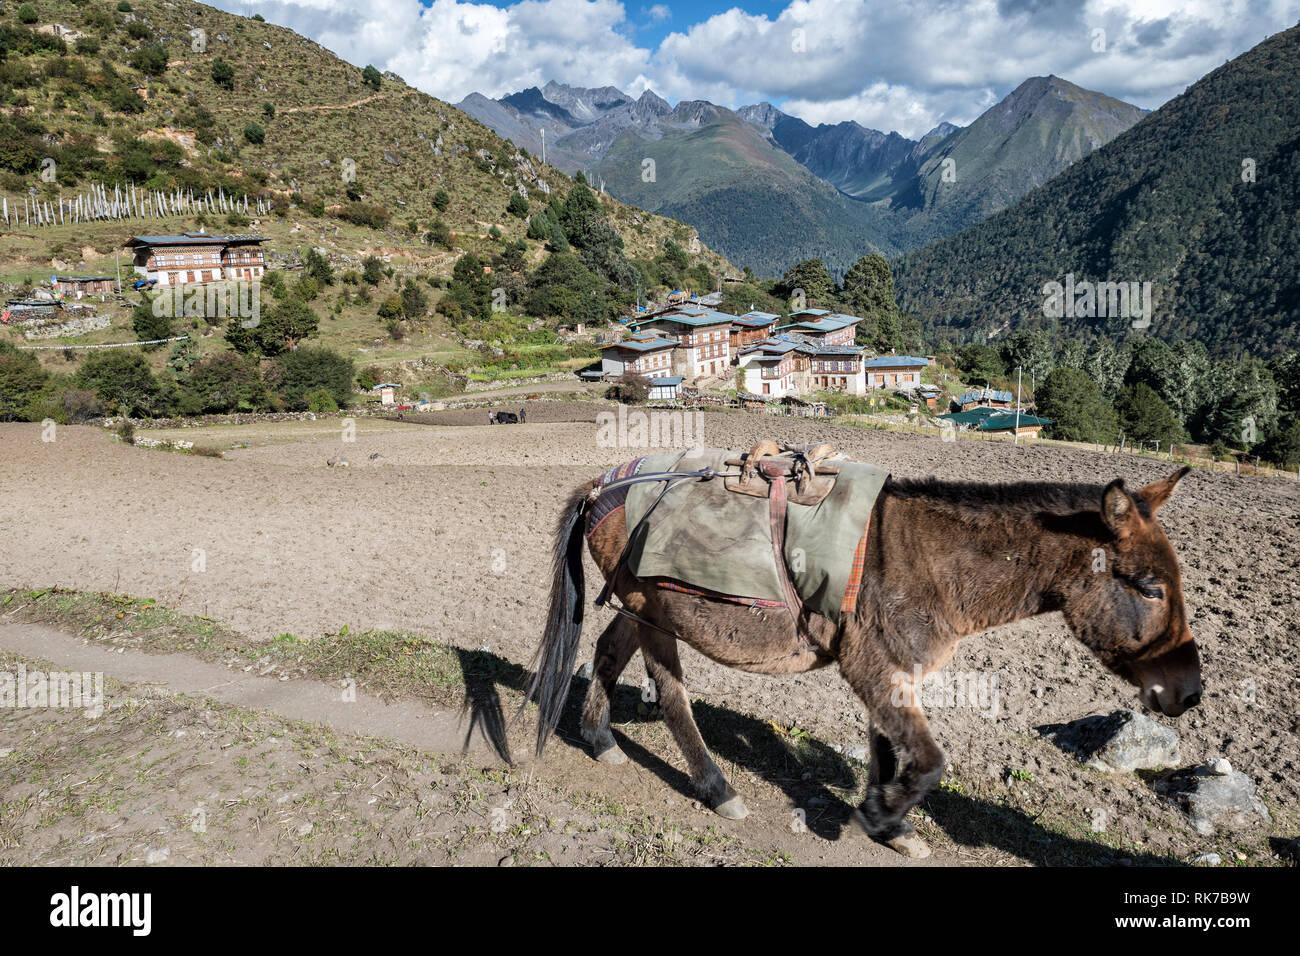 Mule in the remote village of Laya, Gasa District, Snowman Trek, Bhutan Stock Photo